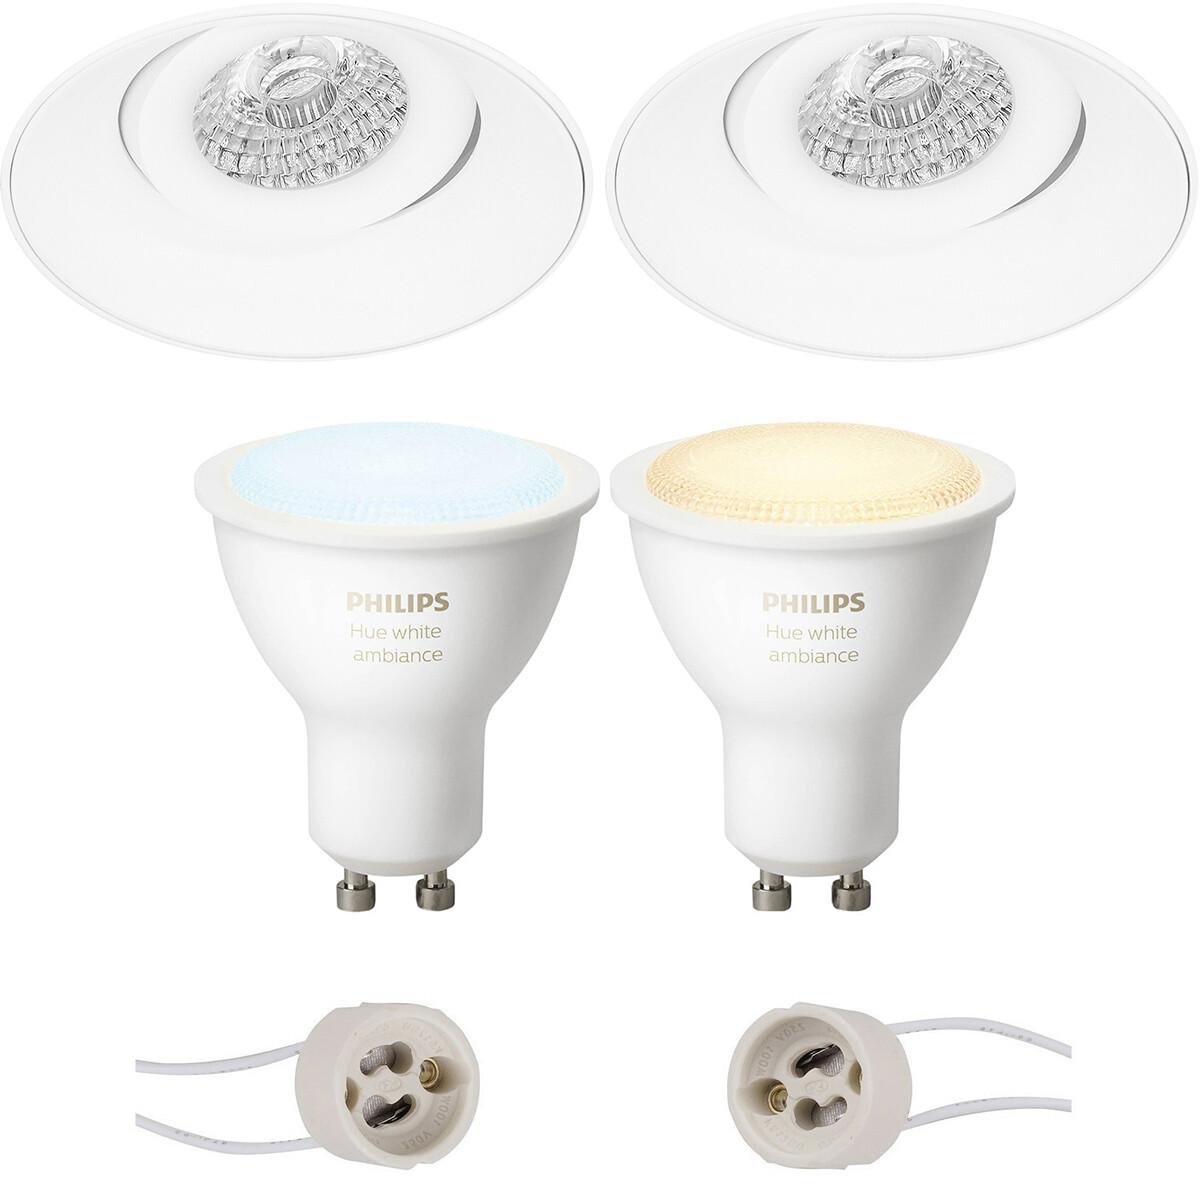 Pragmi Nivas Pro - Inbouw Rond - Mat Wit - Trimless - Kantelbaar - Ø150mm - Philips Hue - LED Spot S